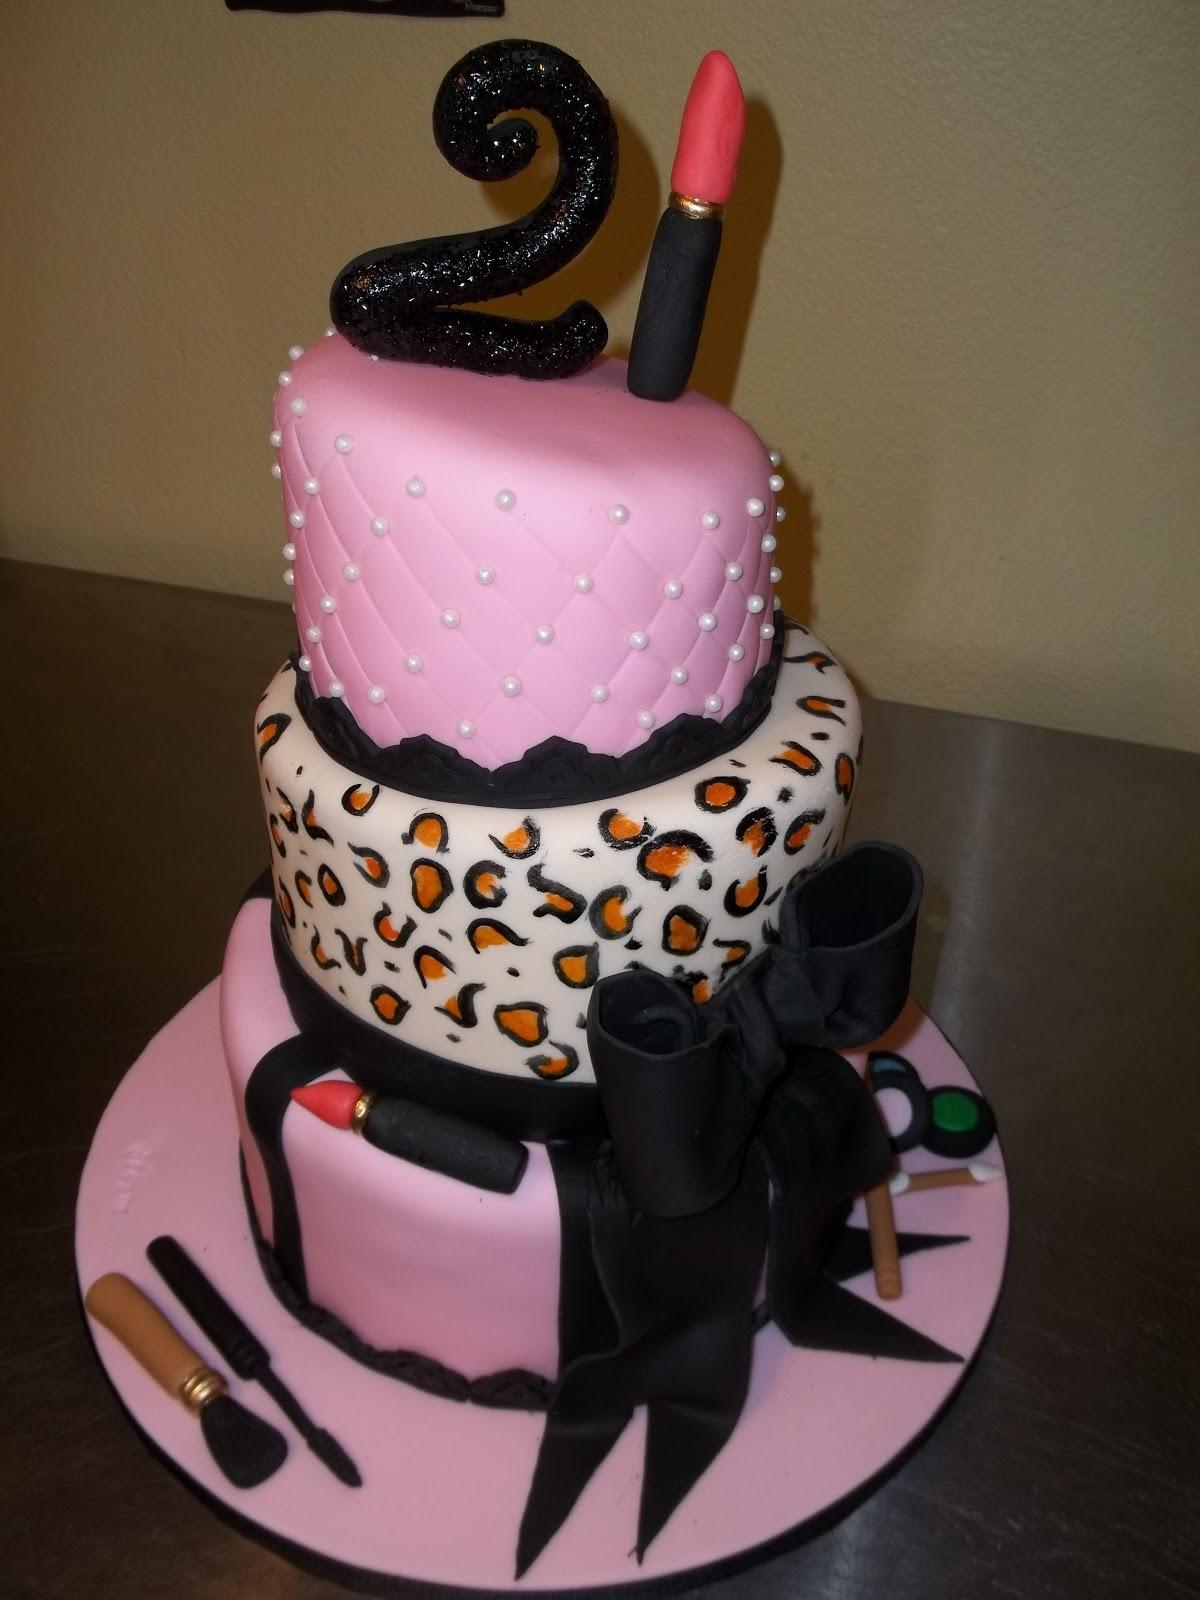 The Sin City Mad Baker Lesleys 21st Birthday Cake